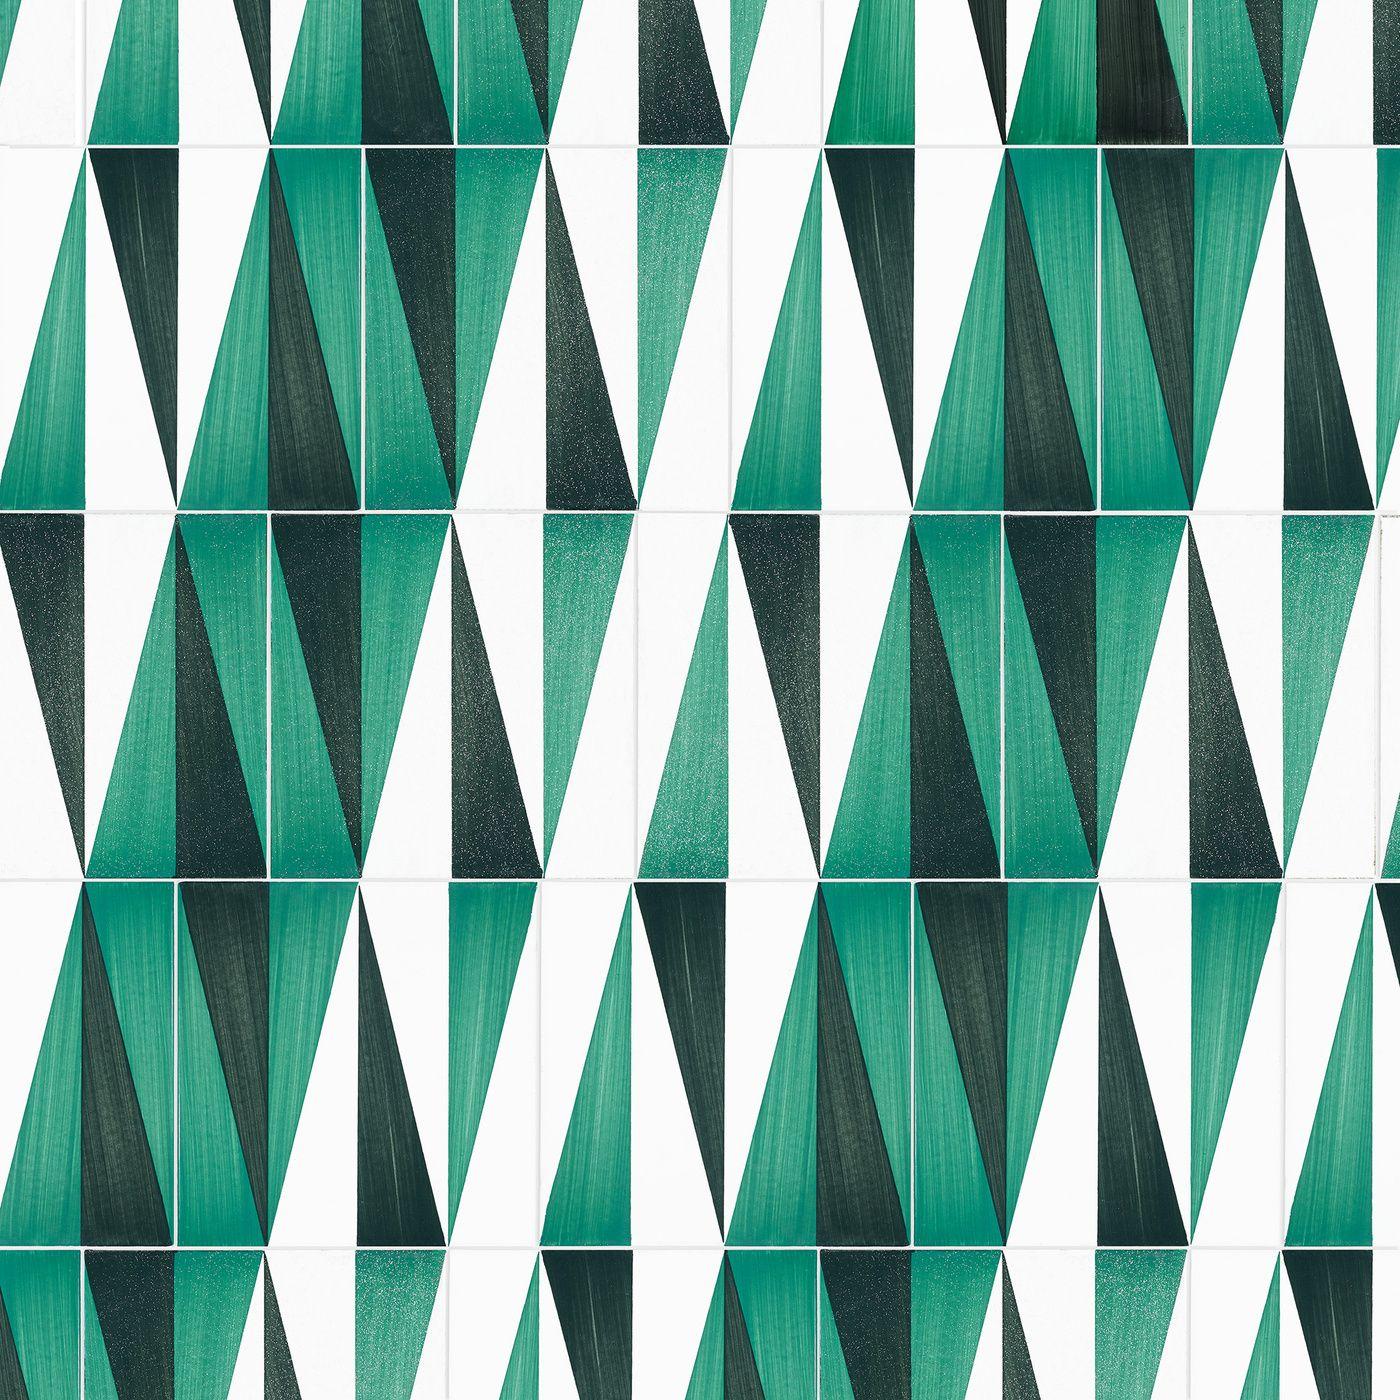 Gio Ponti; Glazed Ceramic Tiles by Ceramica D\'Agostino for the Hotel ...